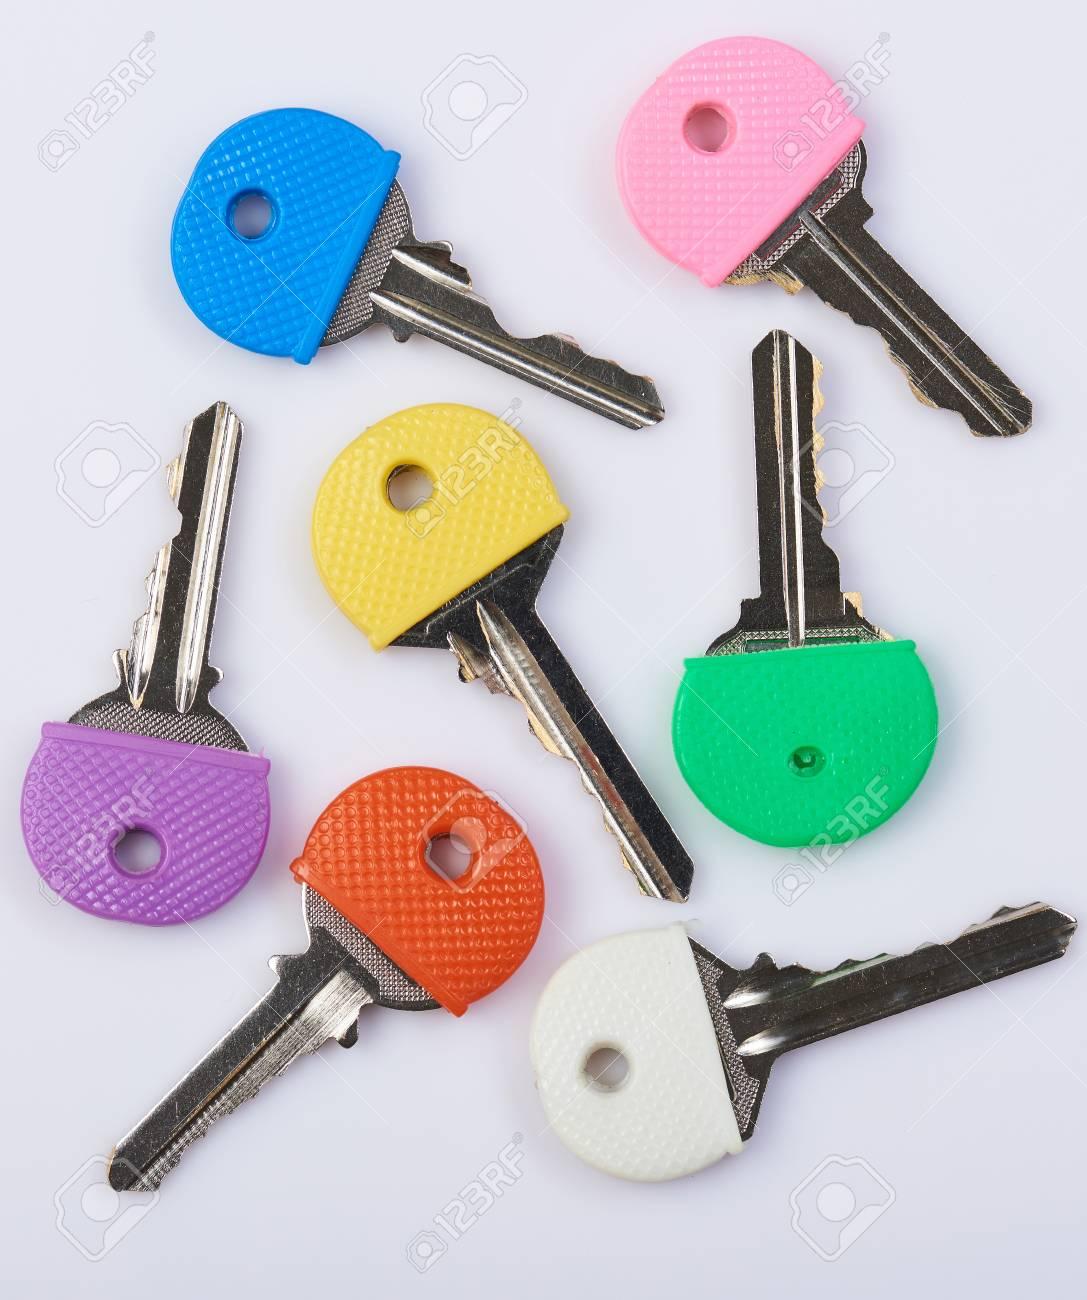 Fullsize Of A Colorful Key